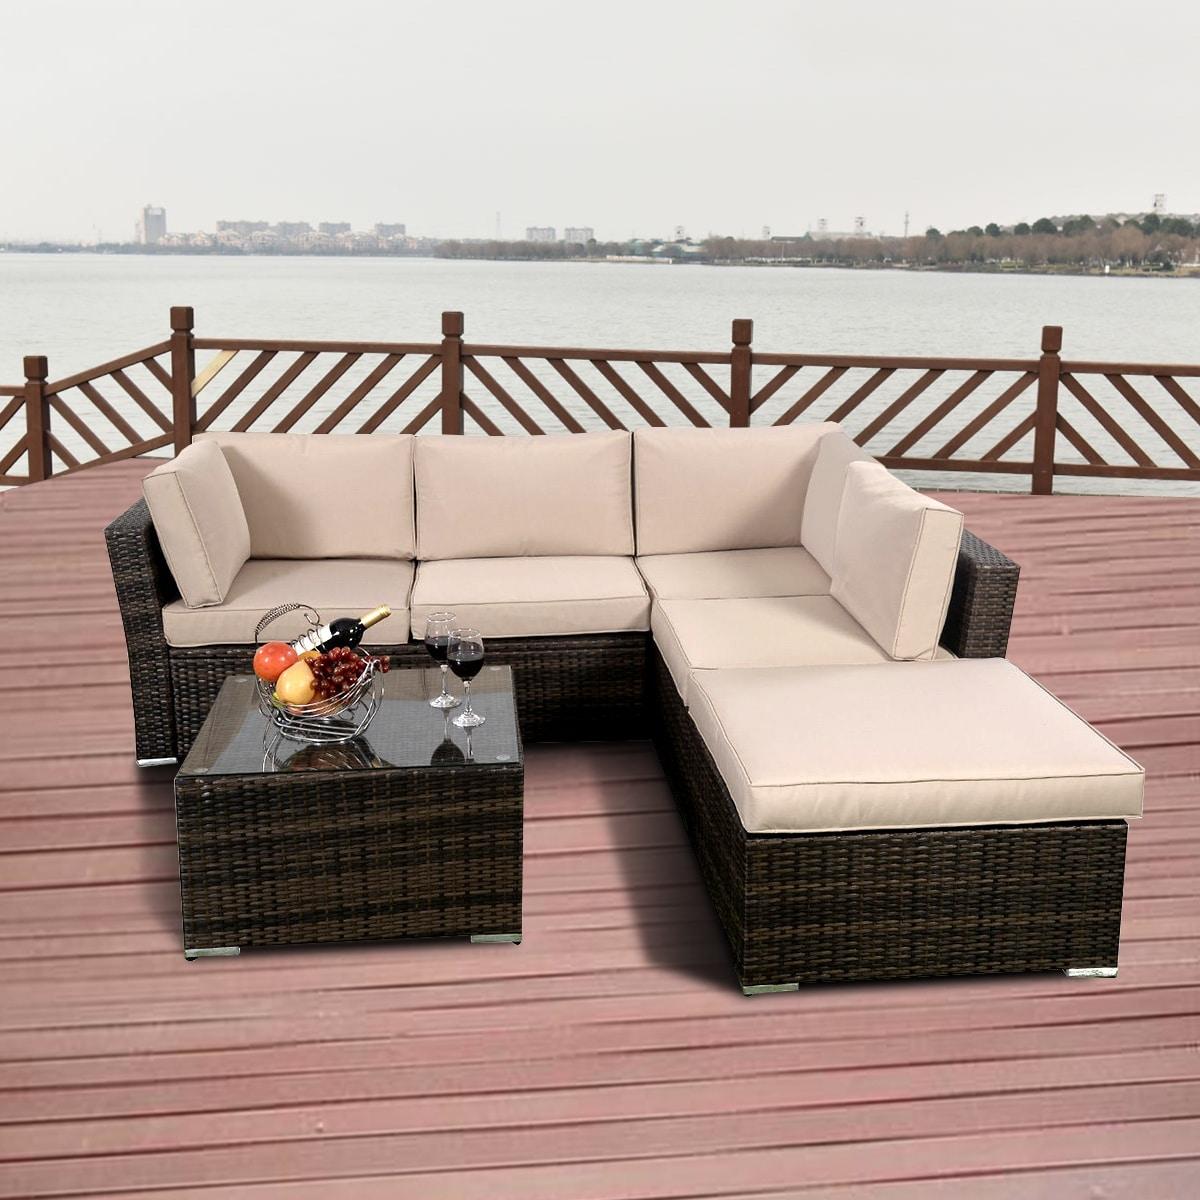 Costway 4pcs Wicker Cushioned Patio Rattan Furniture Set Sofa 5 Seat Garden Lawn Brown Free Shipping Today 15943336